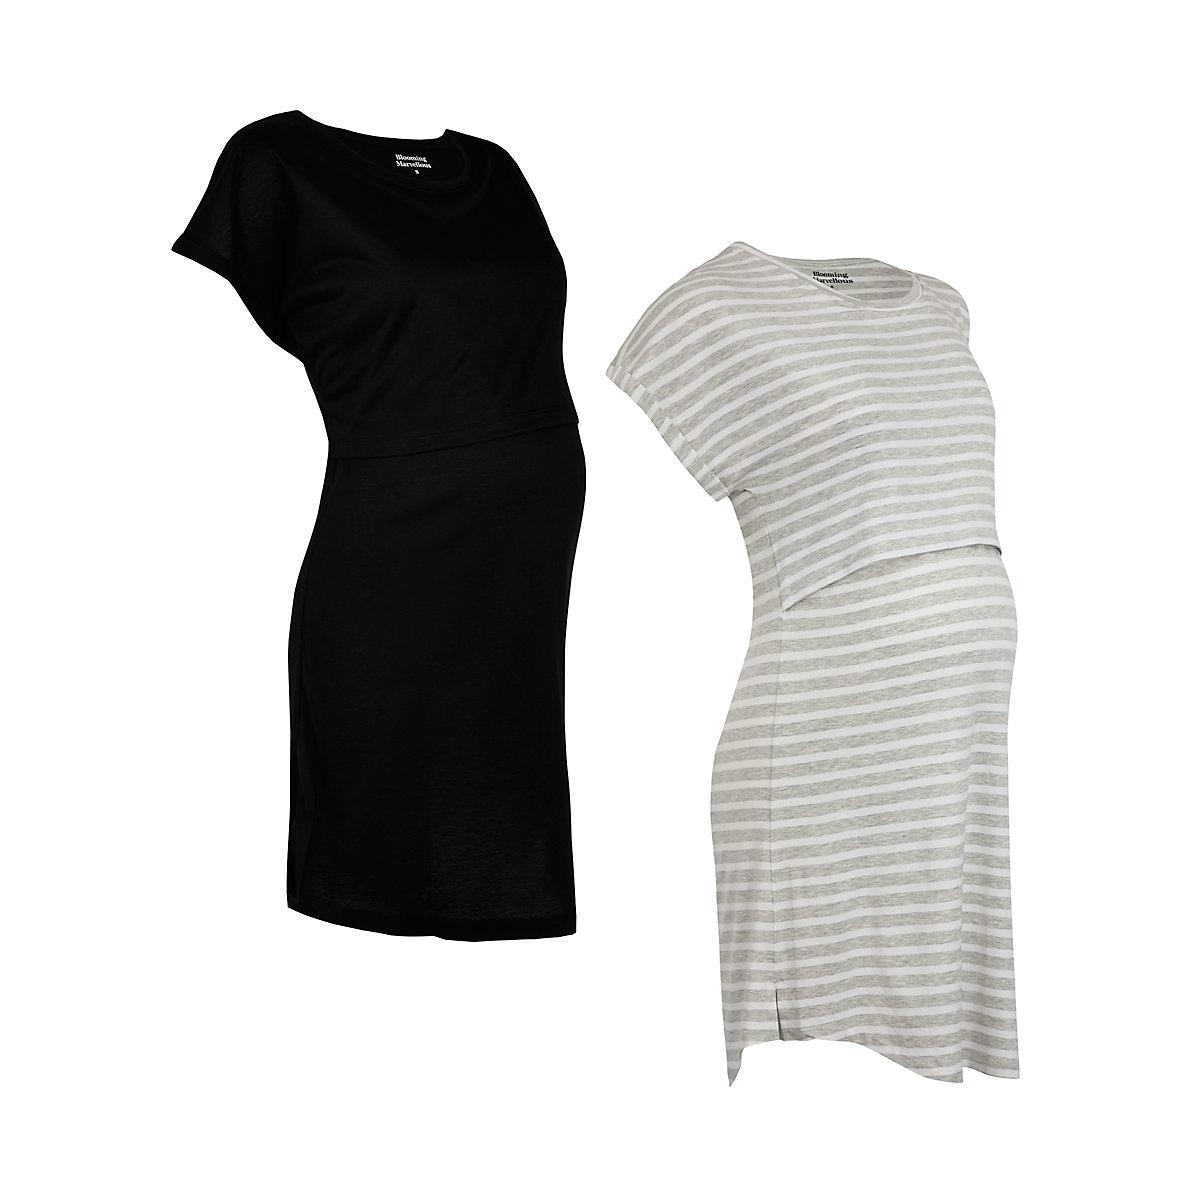 grey and black nursing nightdresses - 2 pack